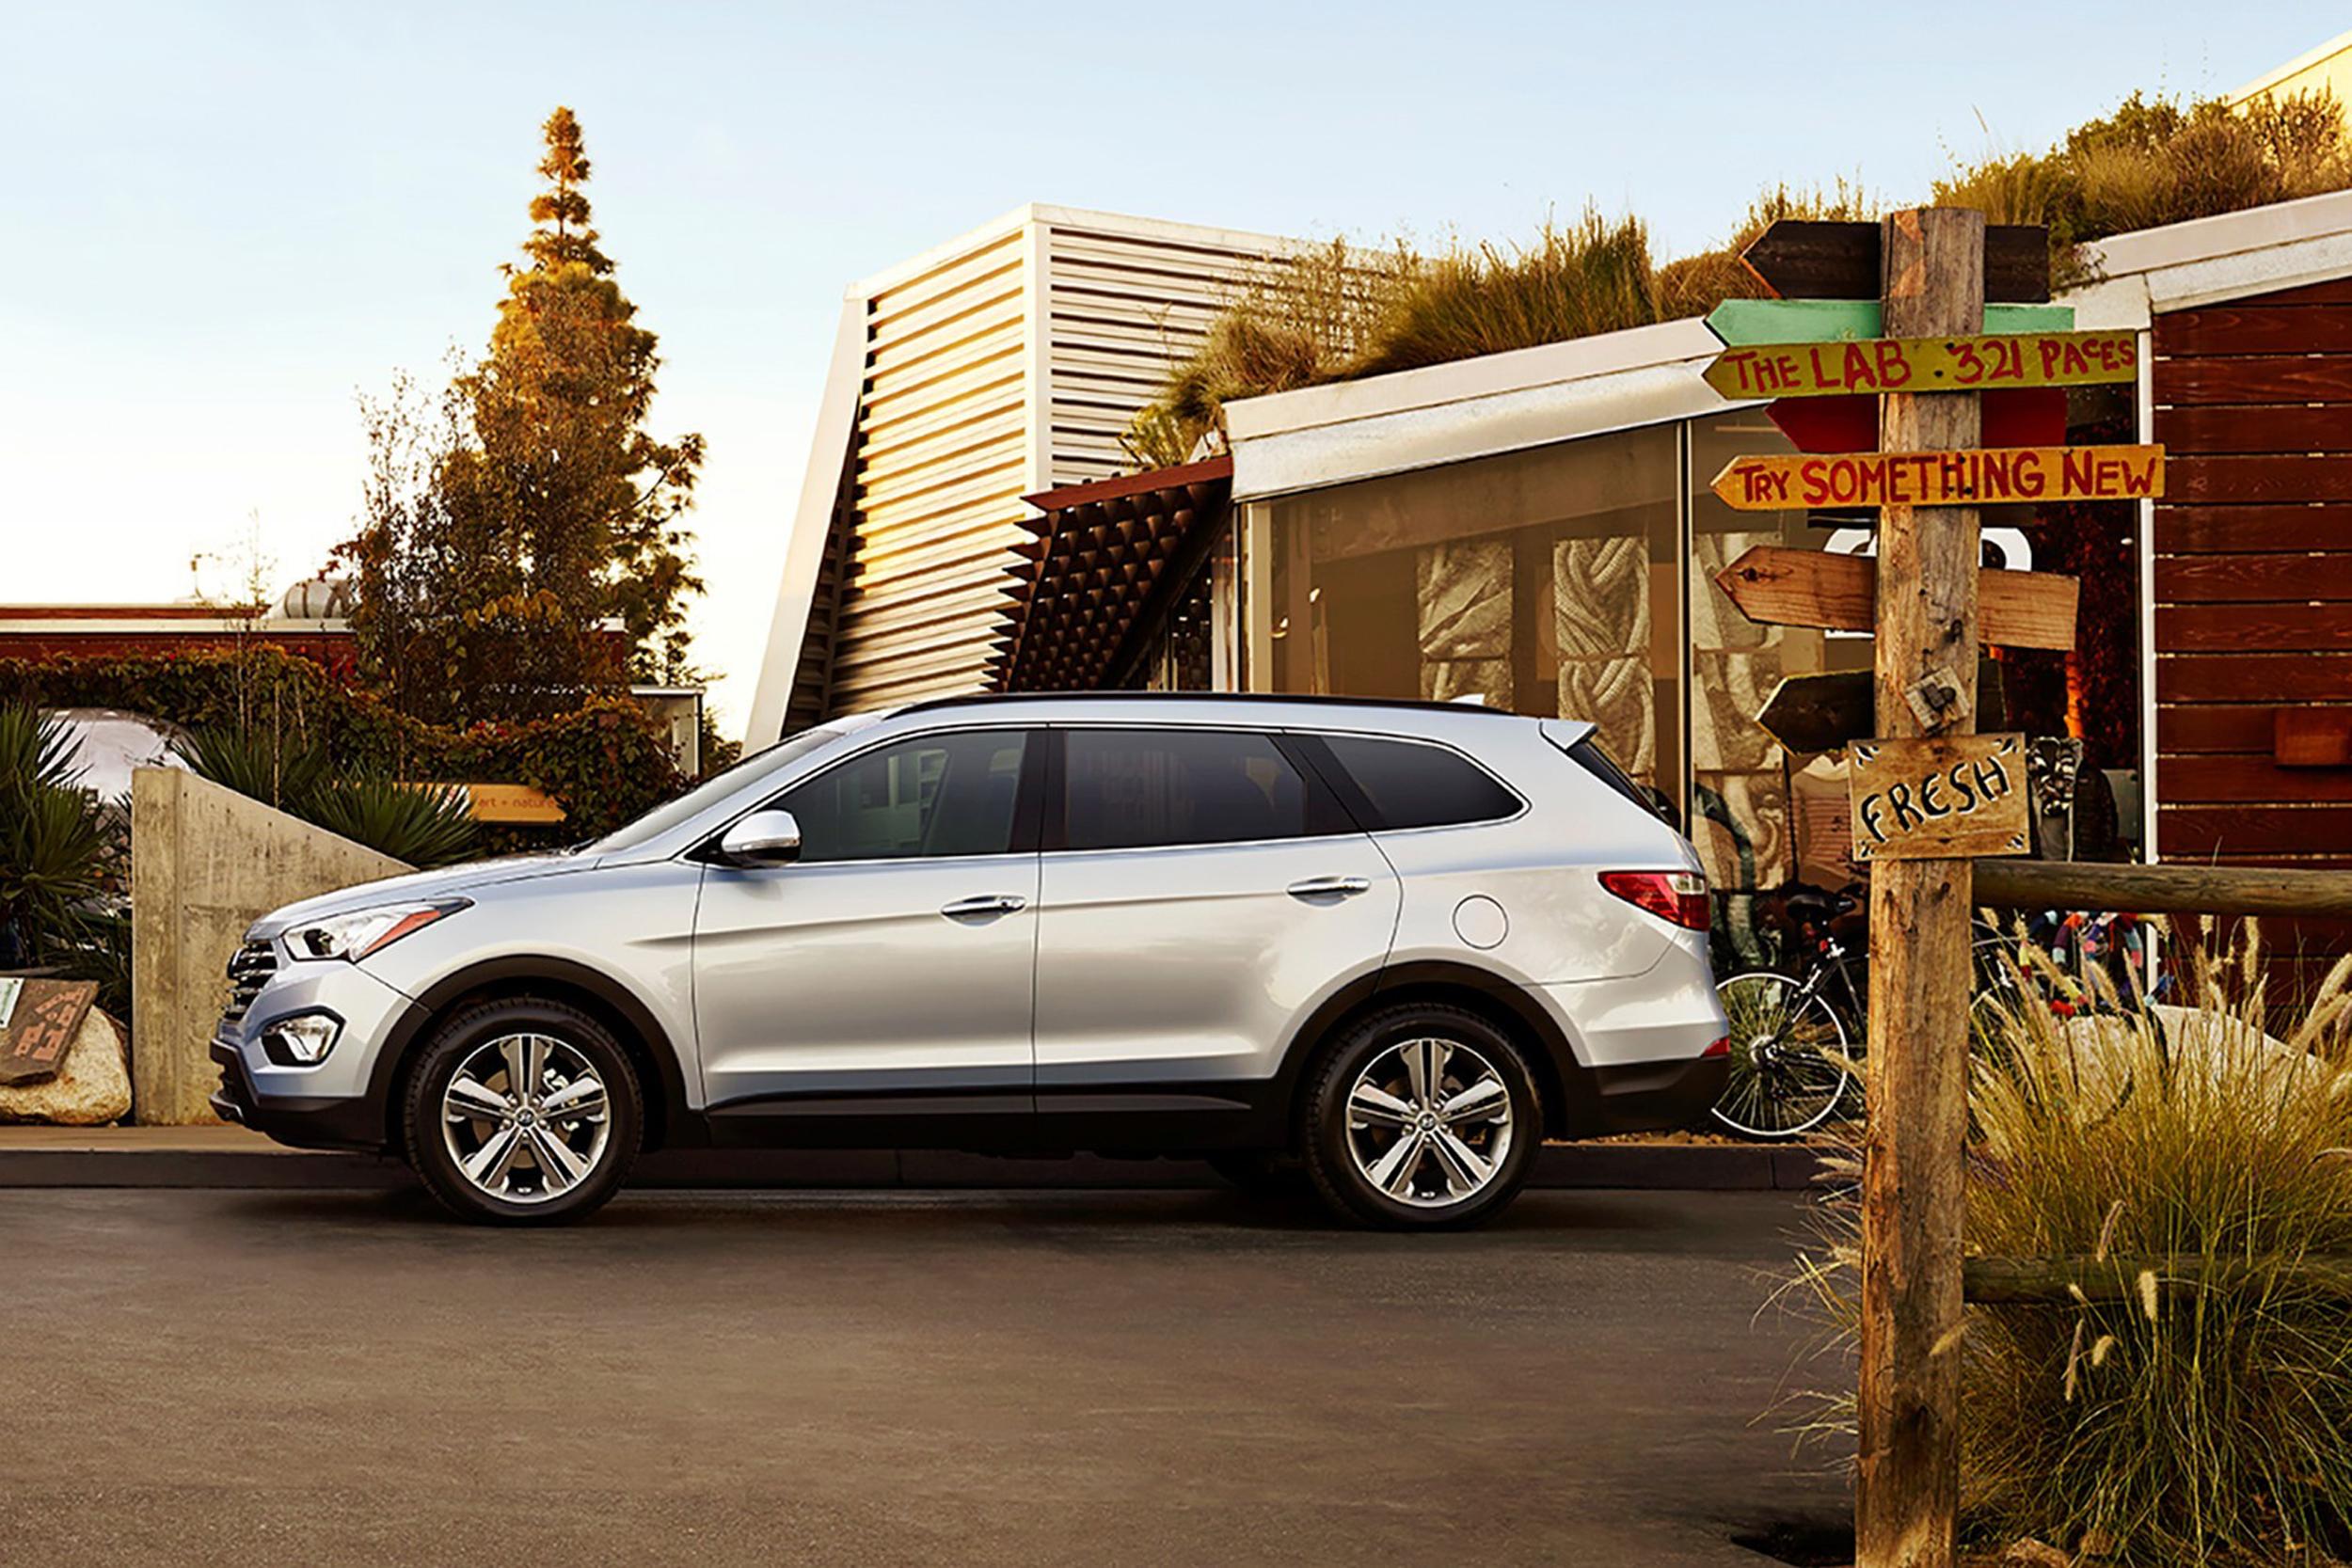 santa model specs hyundai cars prices stats reviews used advice fe uk co faults make usedcarexpert price